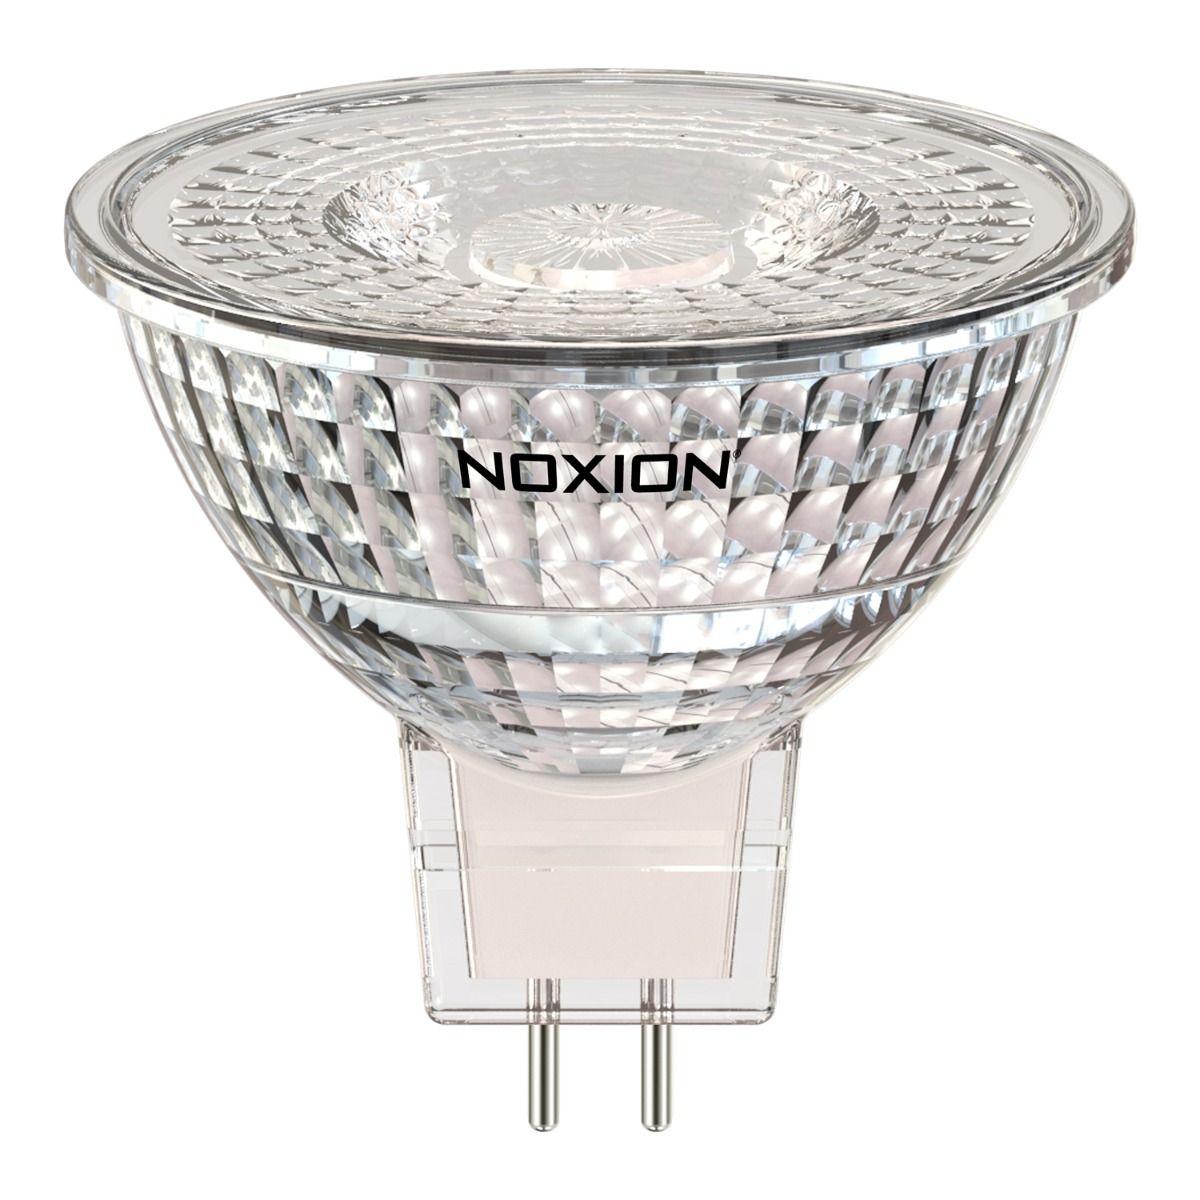 Noxion LED spot GU5.3 5W 830 60D 470lm   dimbar - varm hvit - erstatter 35W